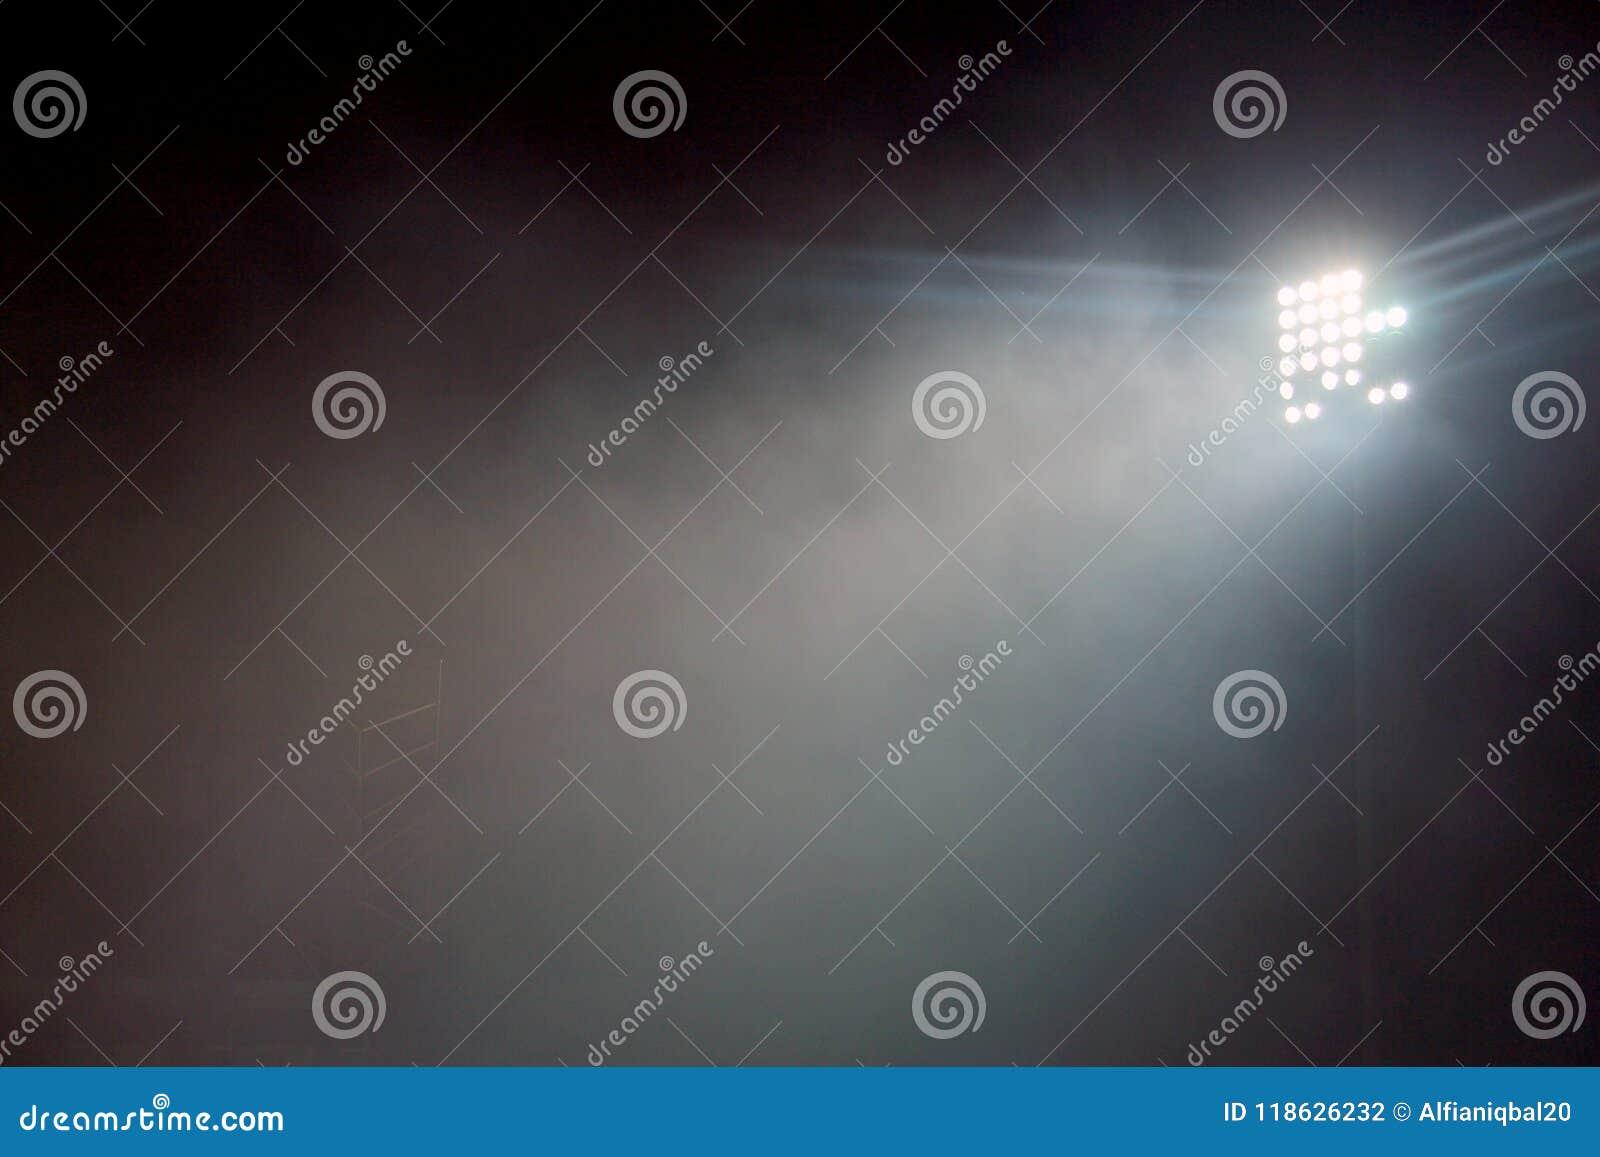 Light tower lit at a stadium during nightime. Stadium lights against dark night sky background. stadium lights and smoke